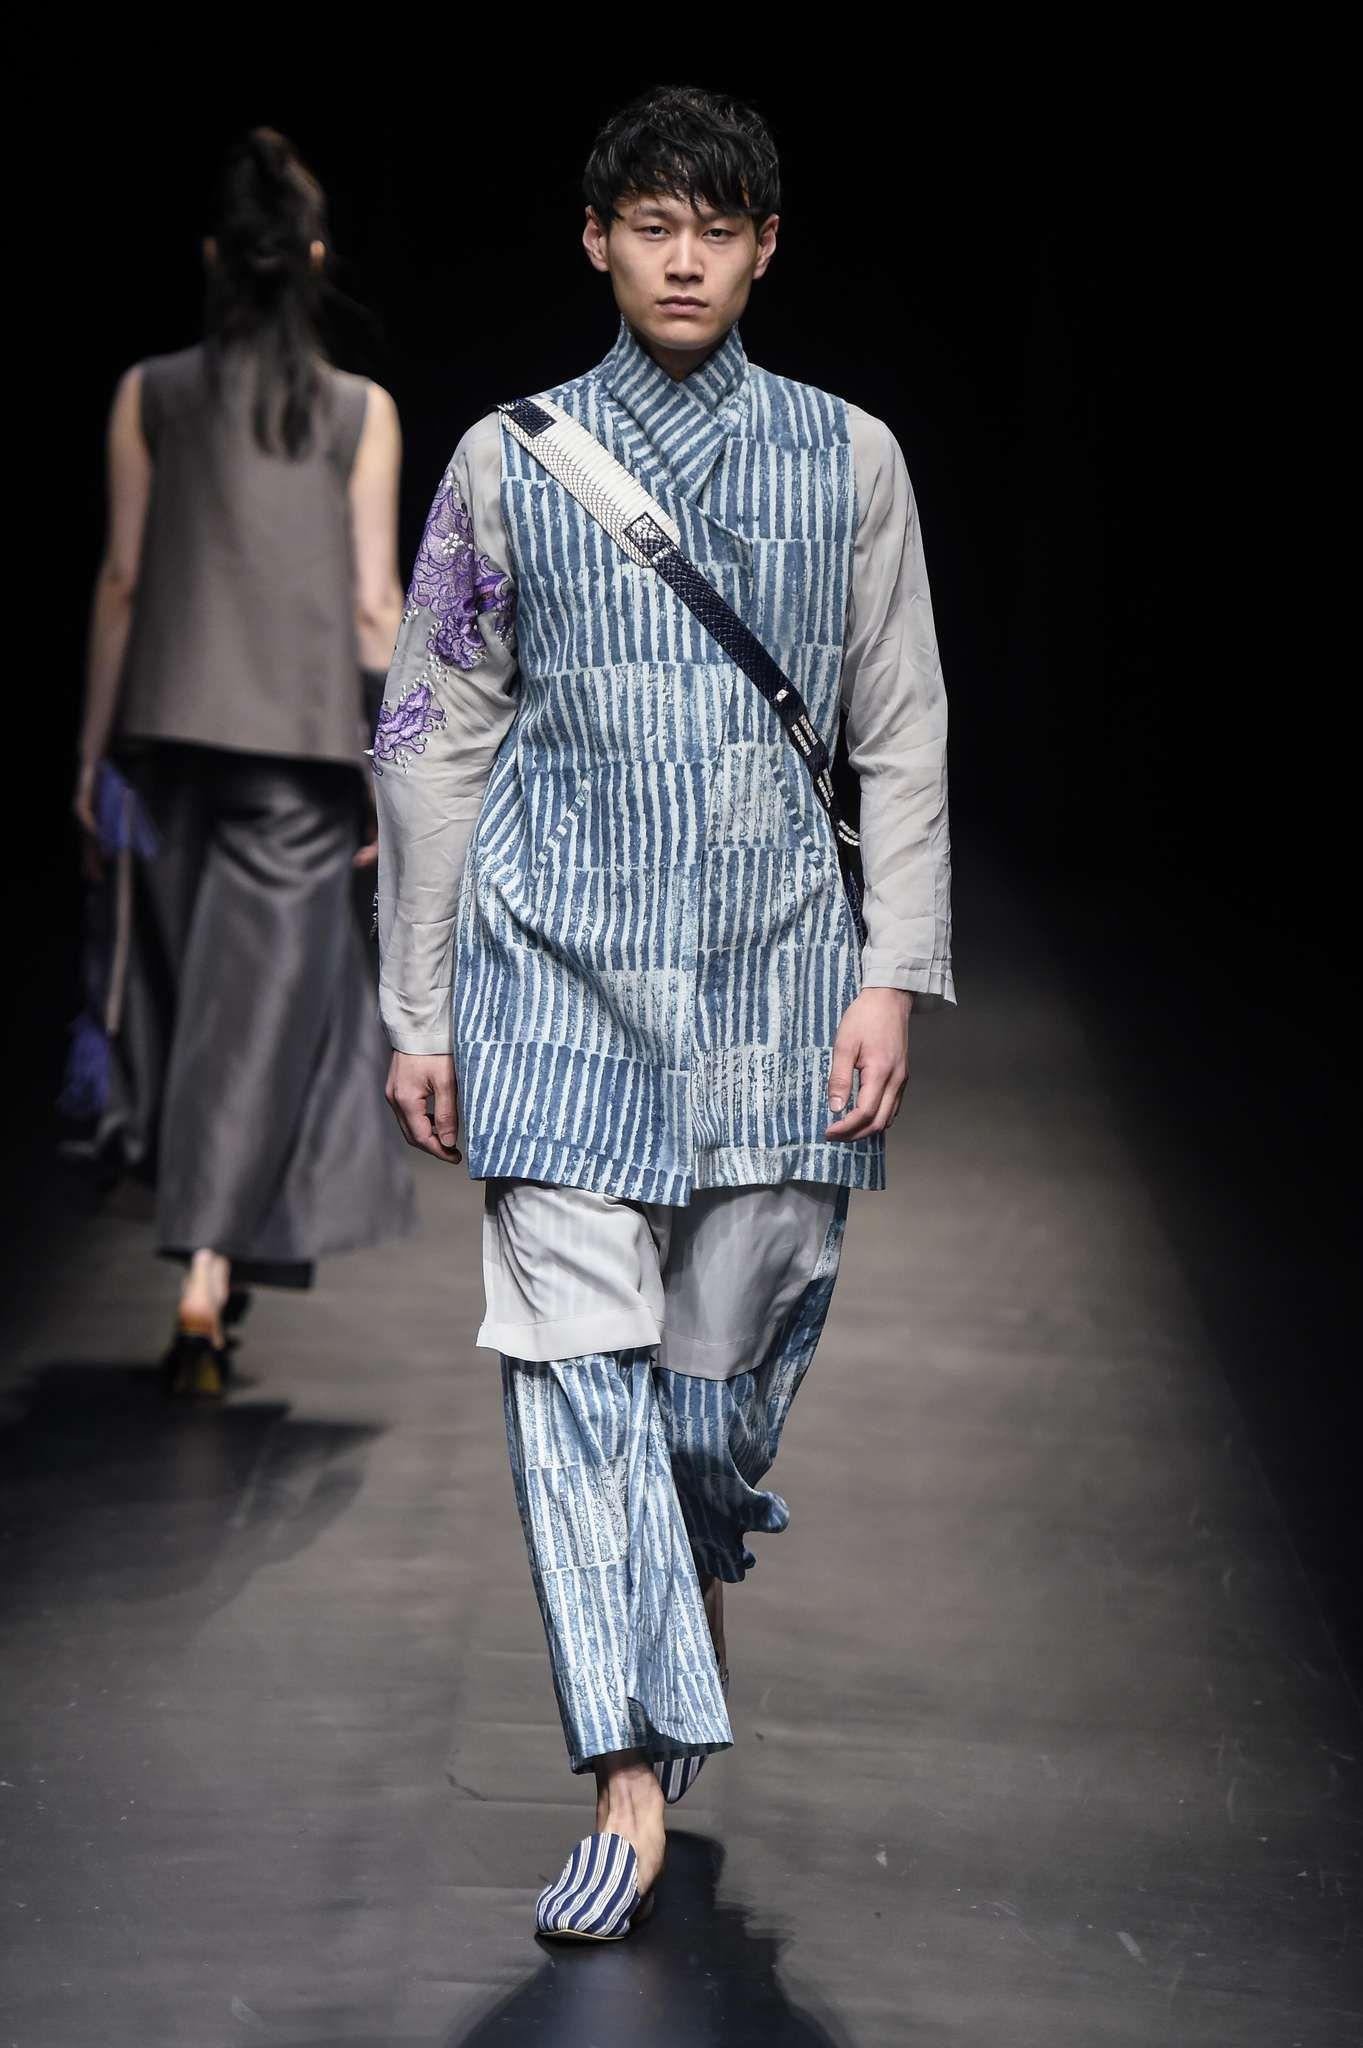 Indonesia Fashion Week Indonesia fashion, Indonesia